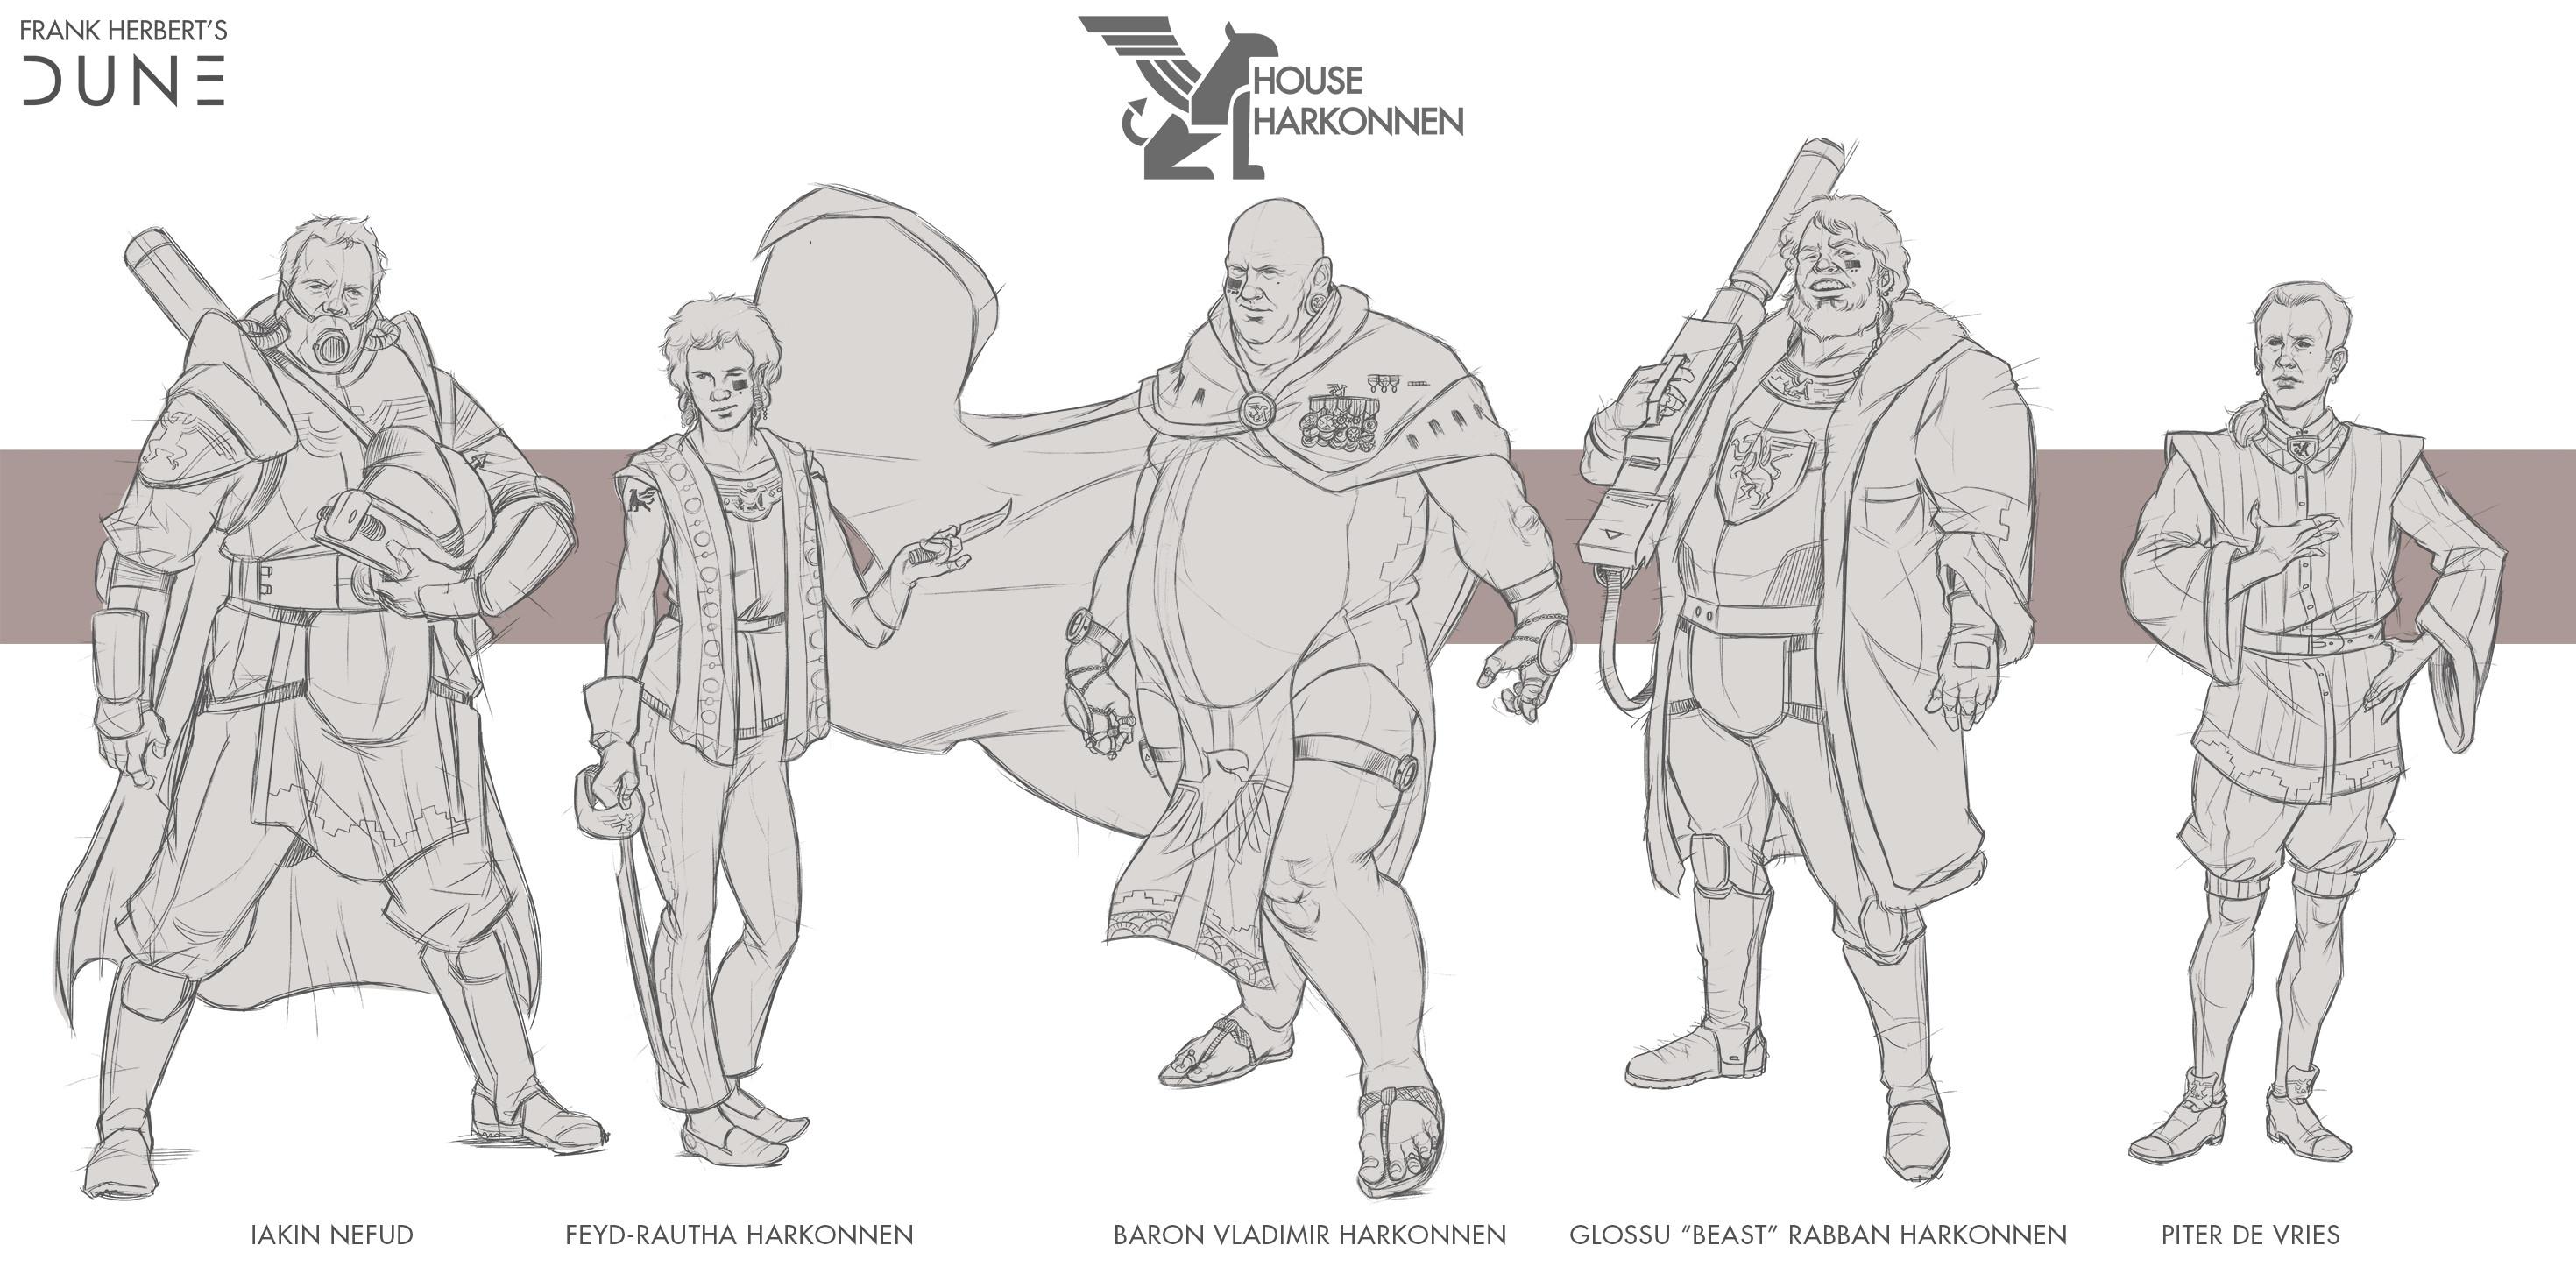 DUNE art: Imperial Sardaukars   The Art of Dune   Pinterest   Dune art, Sci  fi and Sci fi fantasy